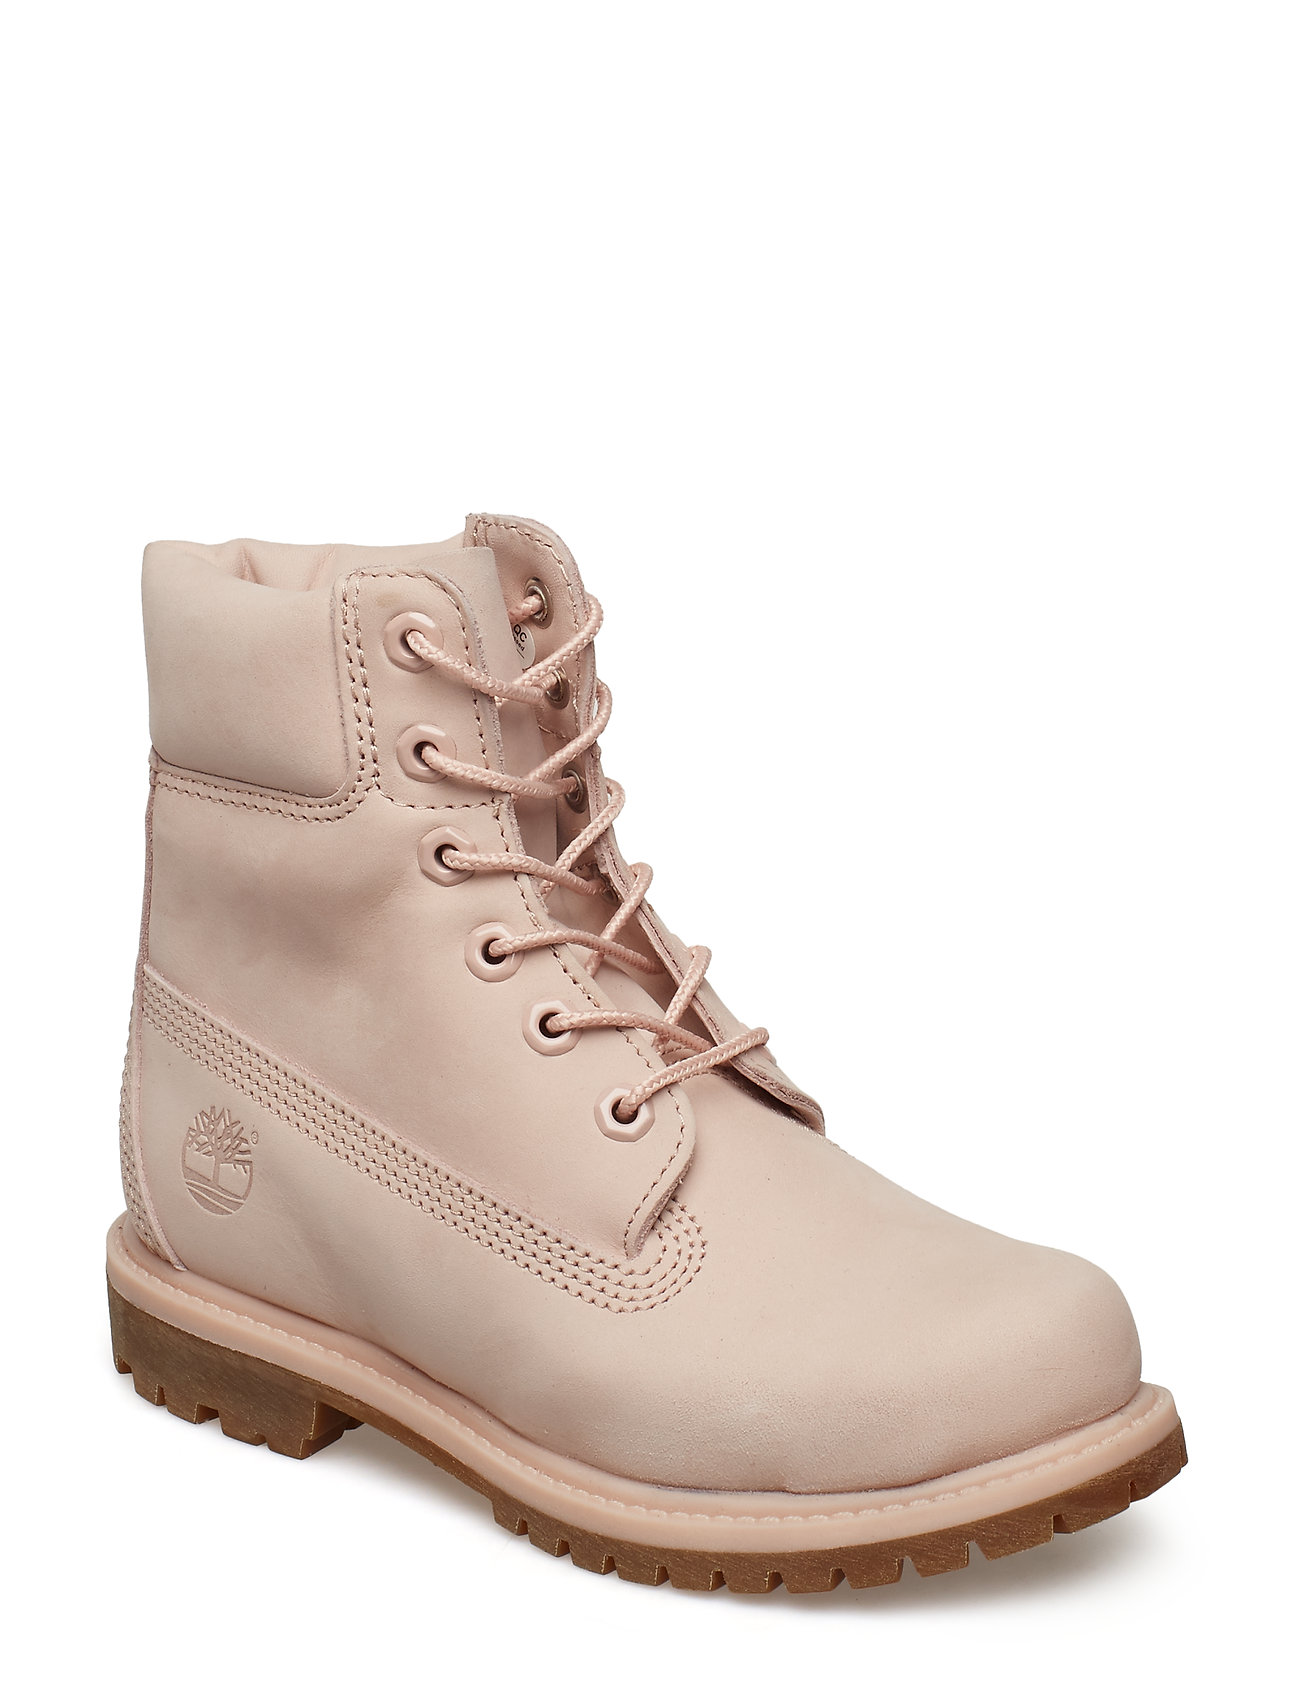 TIMBERLAND 6in Premium Boot - W Stiefelette Ohne Absatz Pink TIMBERLAND